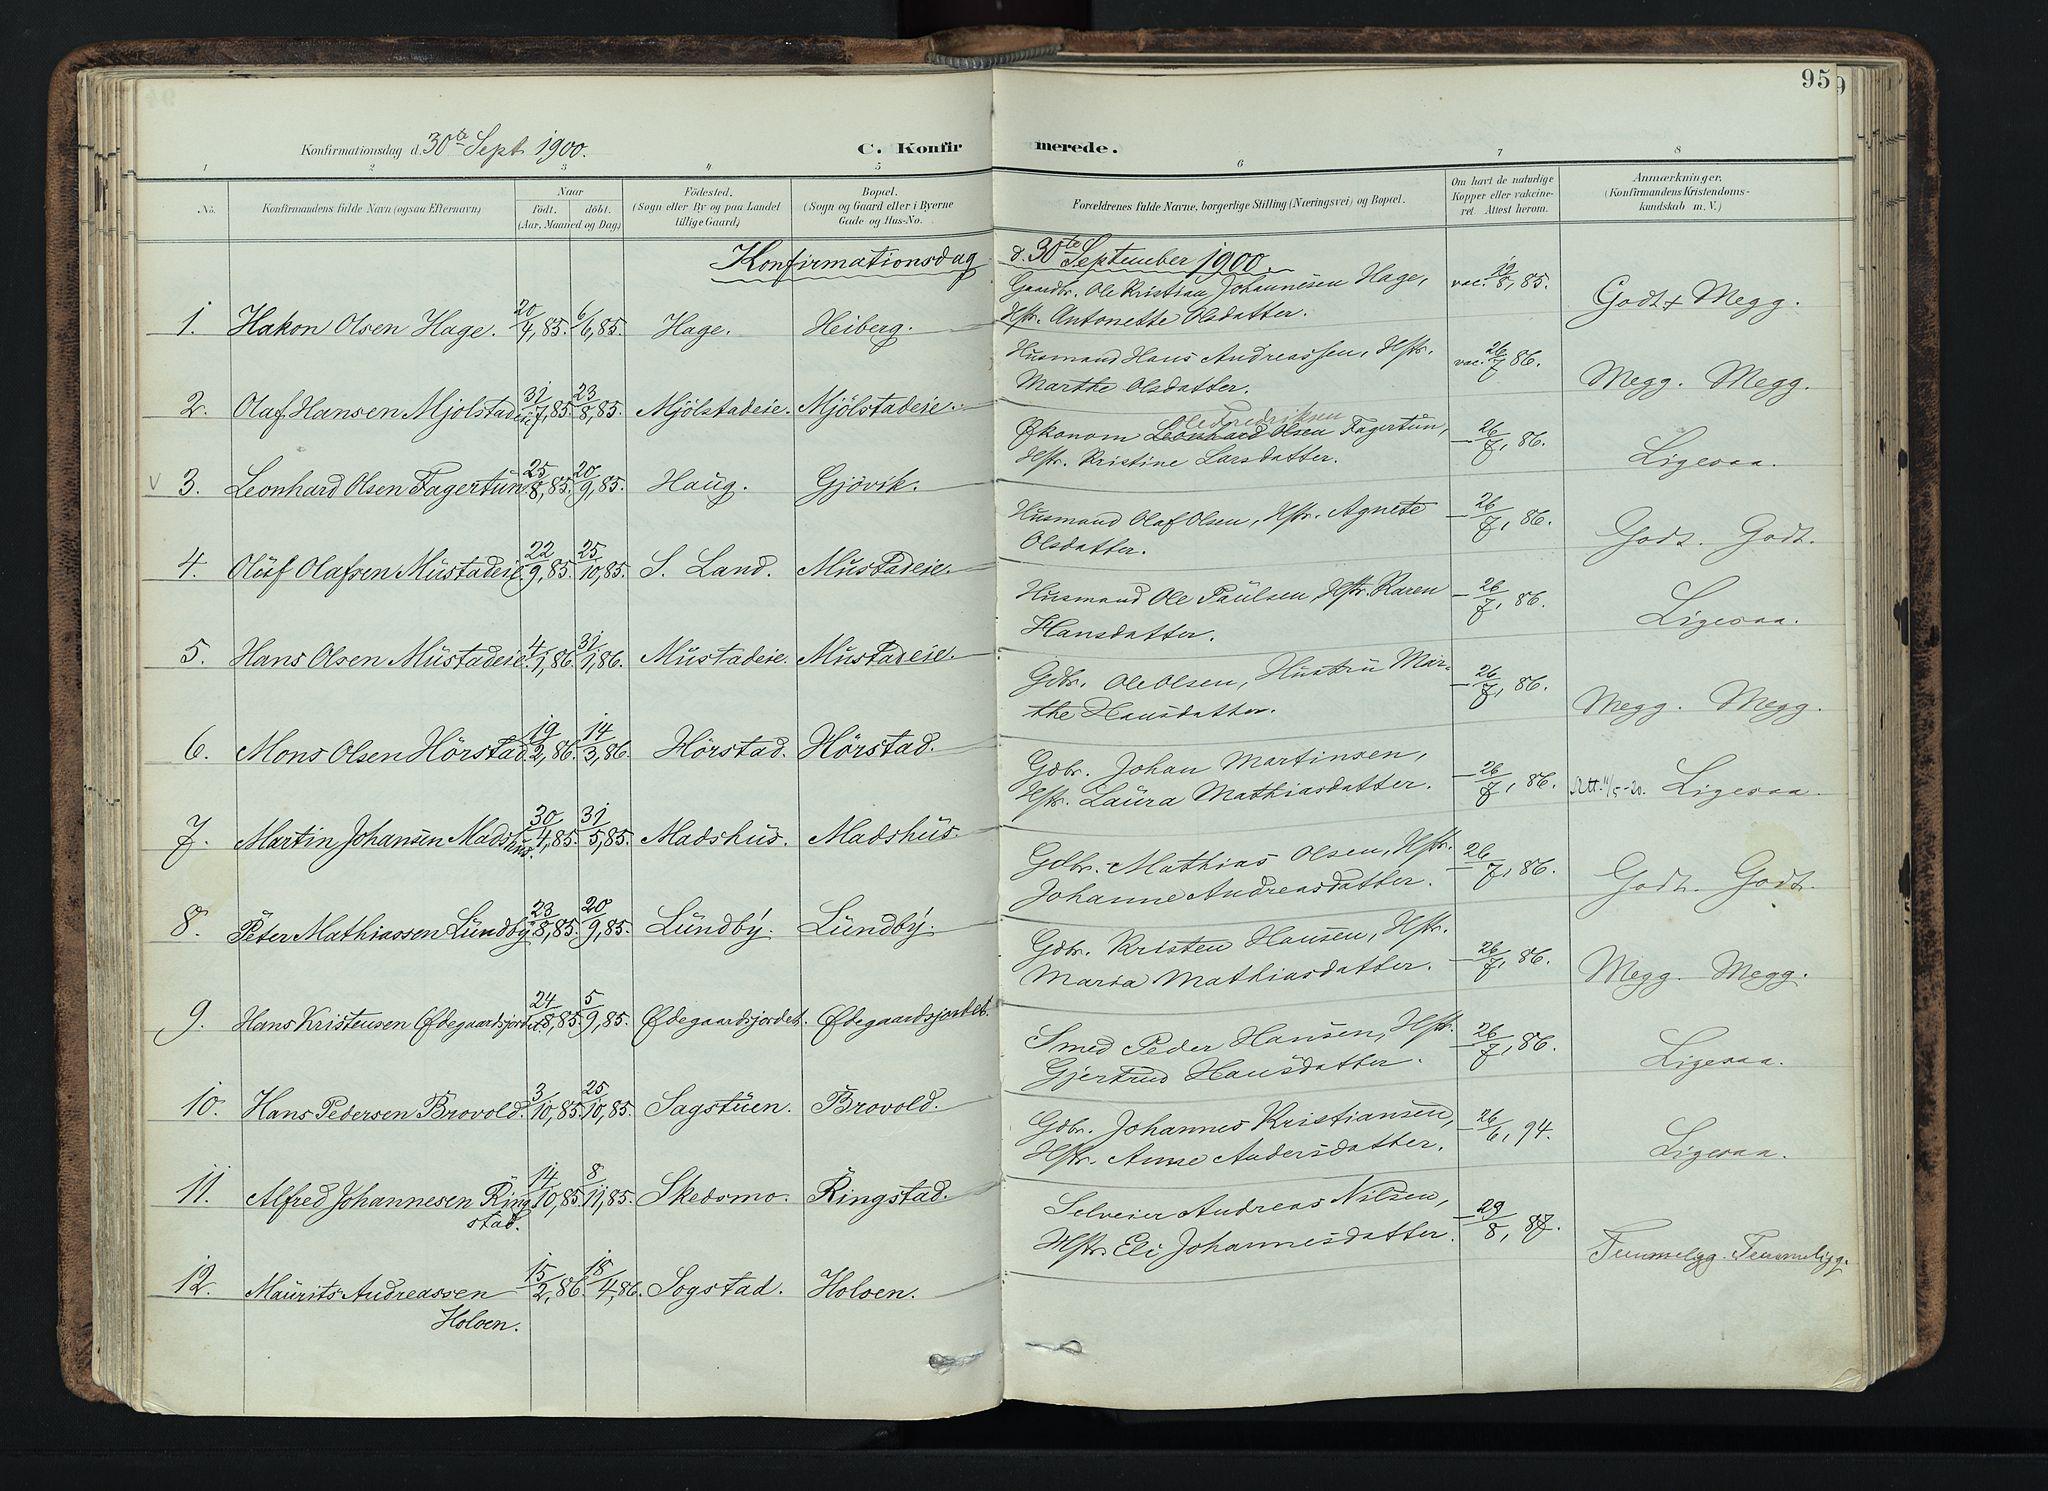 SAH, Vardal prestekontor, H/Ha/Haa/L0019: Ministerialbok nr. 19, 1893-1907, s. 95